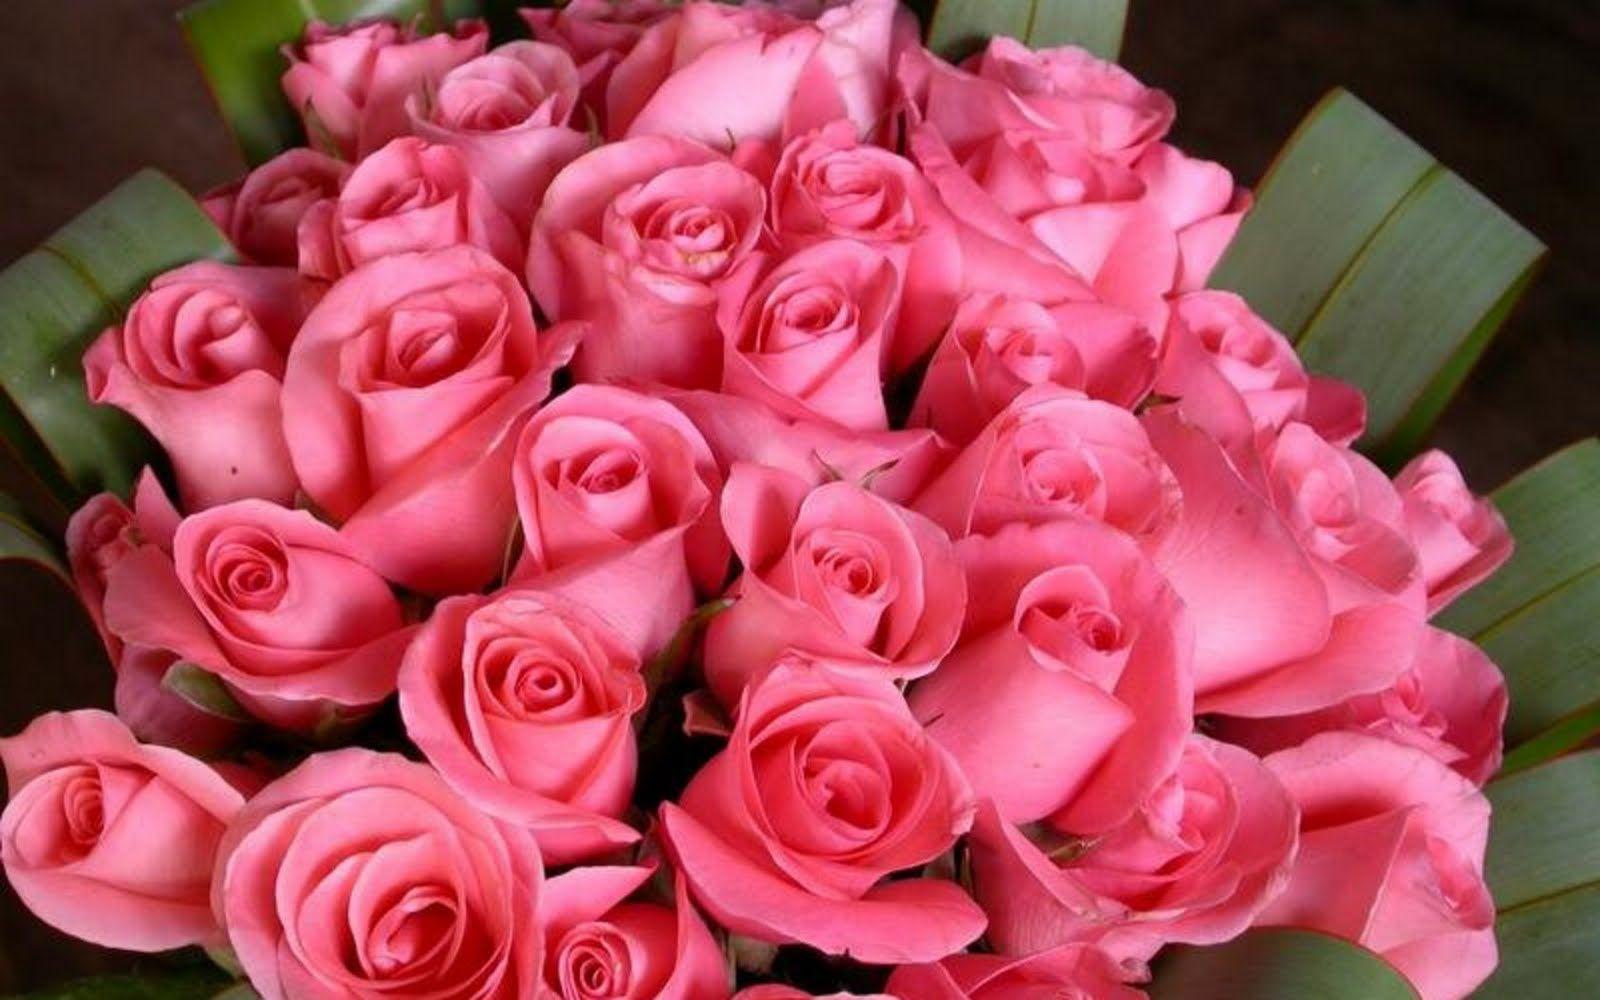 Dozen Pink Roses Dozen Pink Roses Deseos De Pasion Pinterest